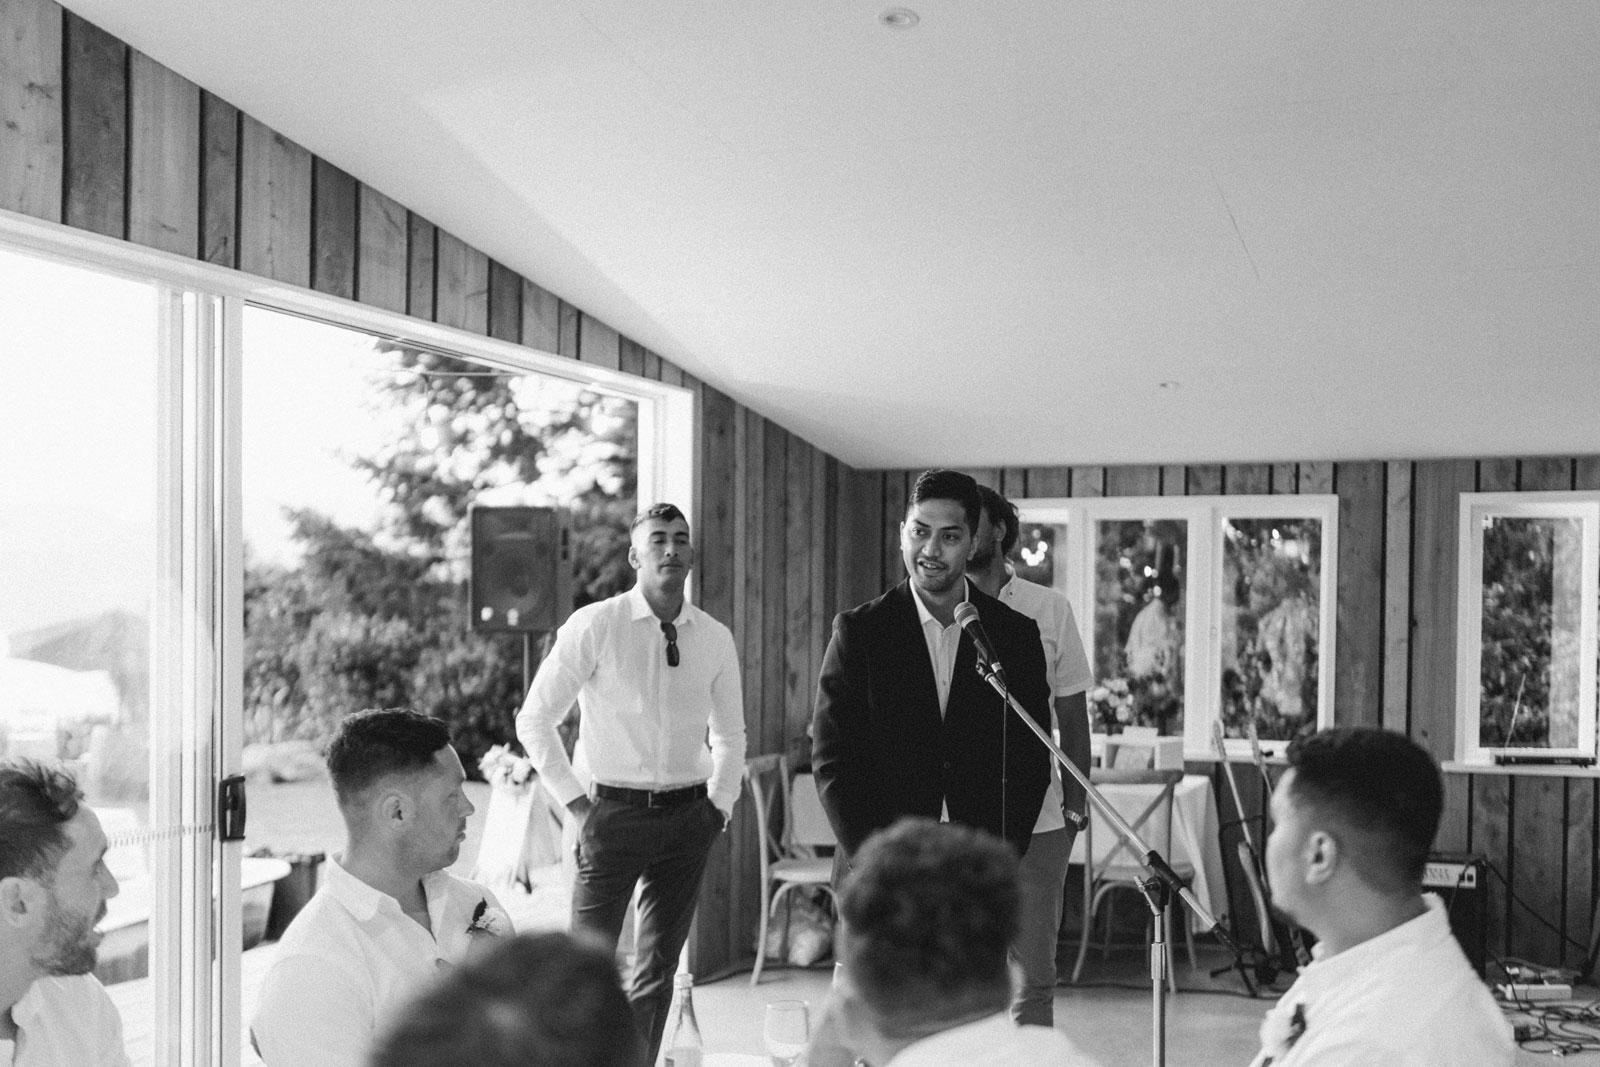 newfound-n-w-black-barn-tarawera-rotorua-wedding-photographer-954A